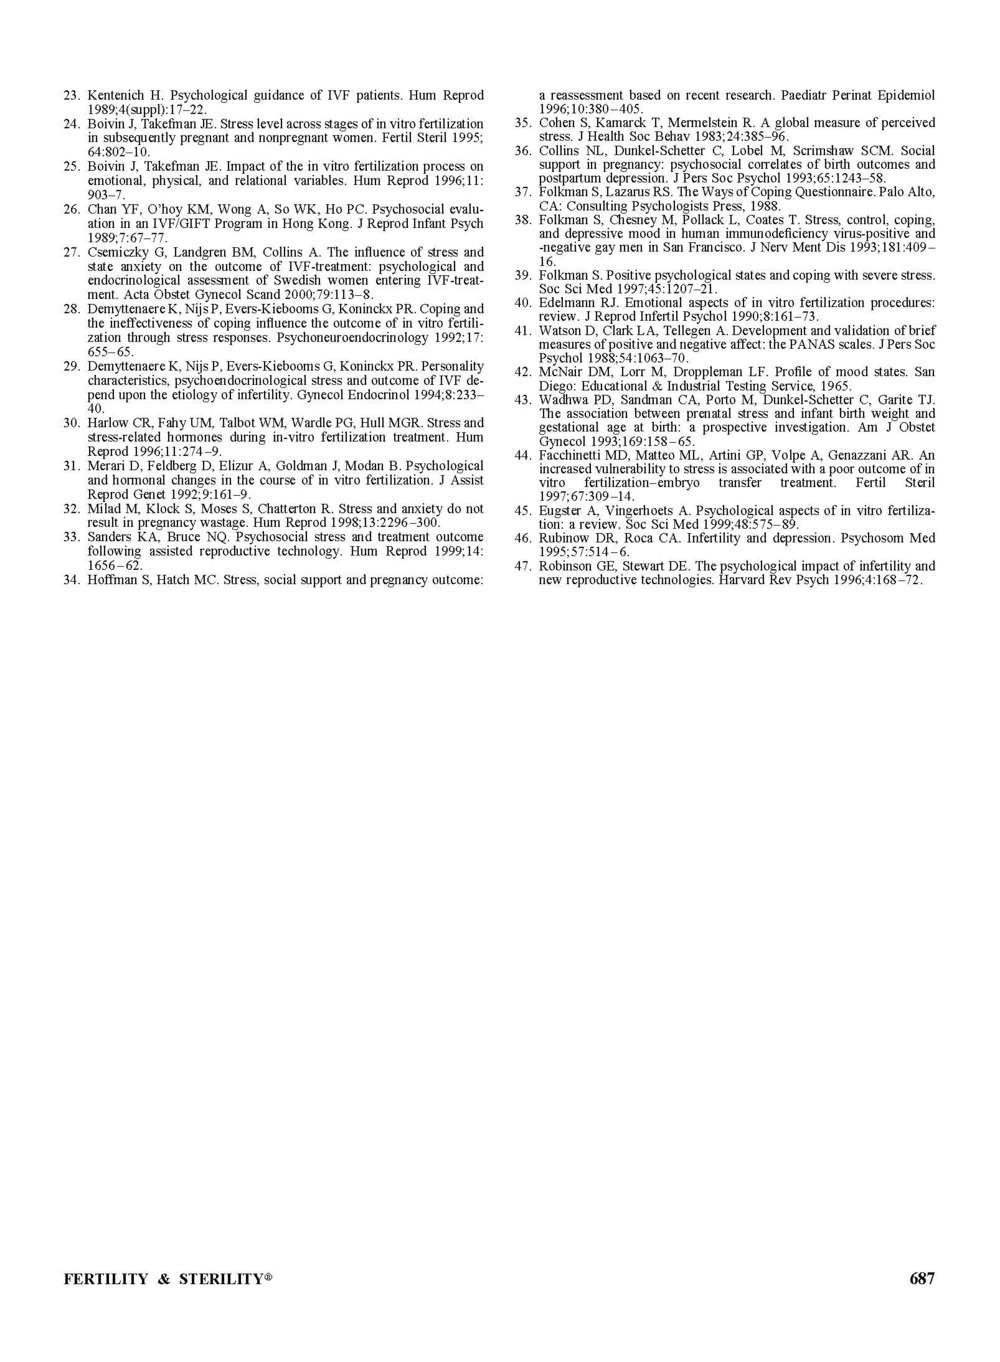 Research_3_pg12.jpg